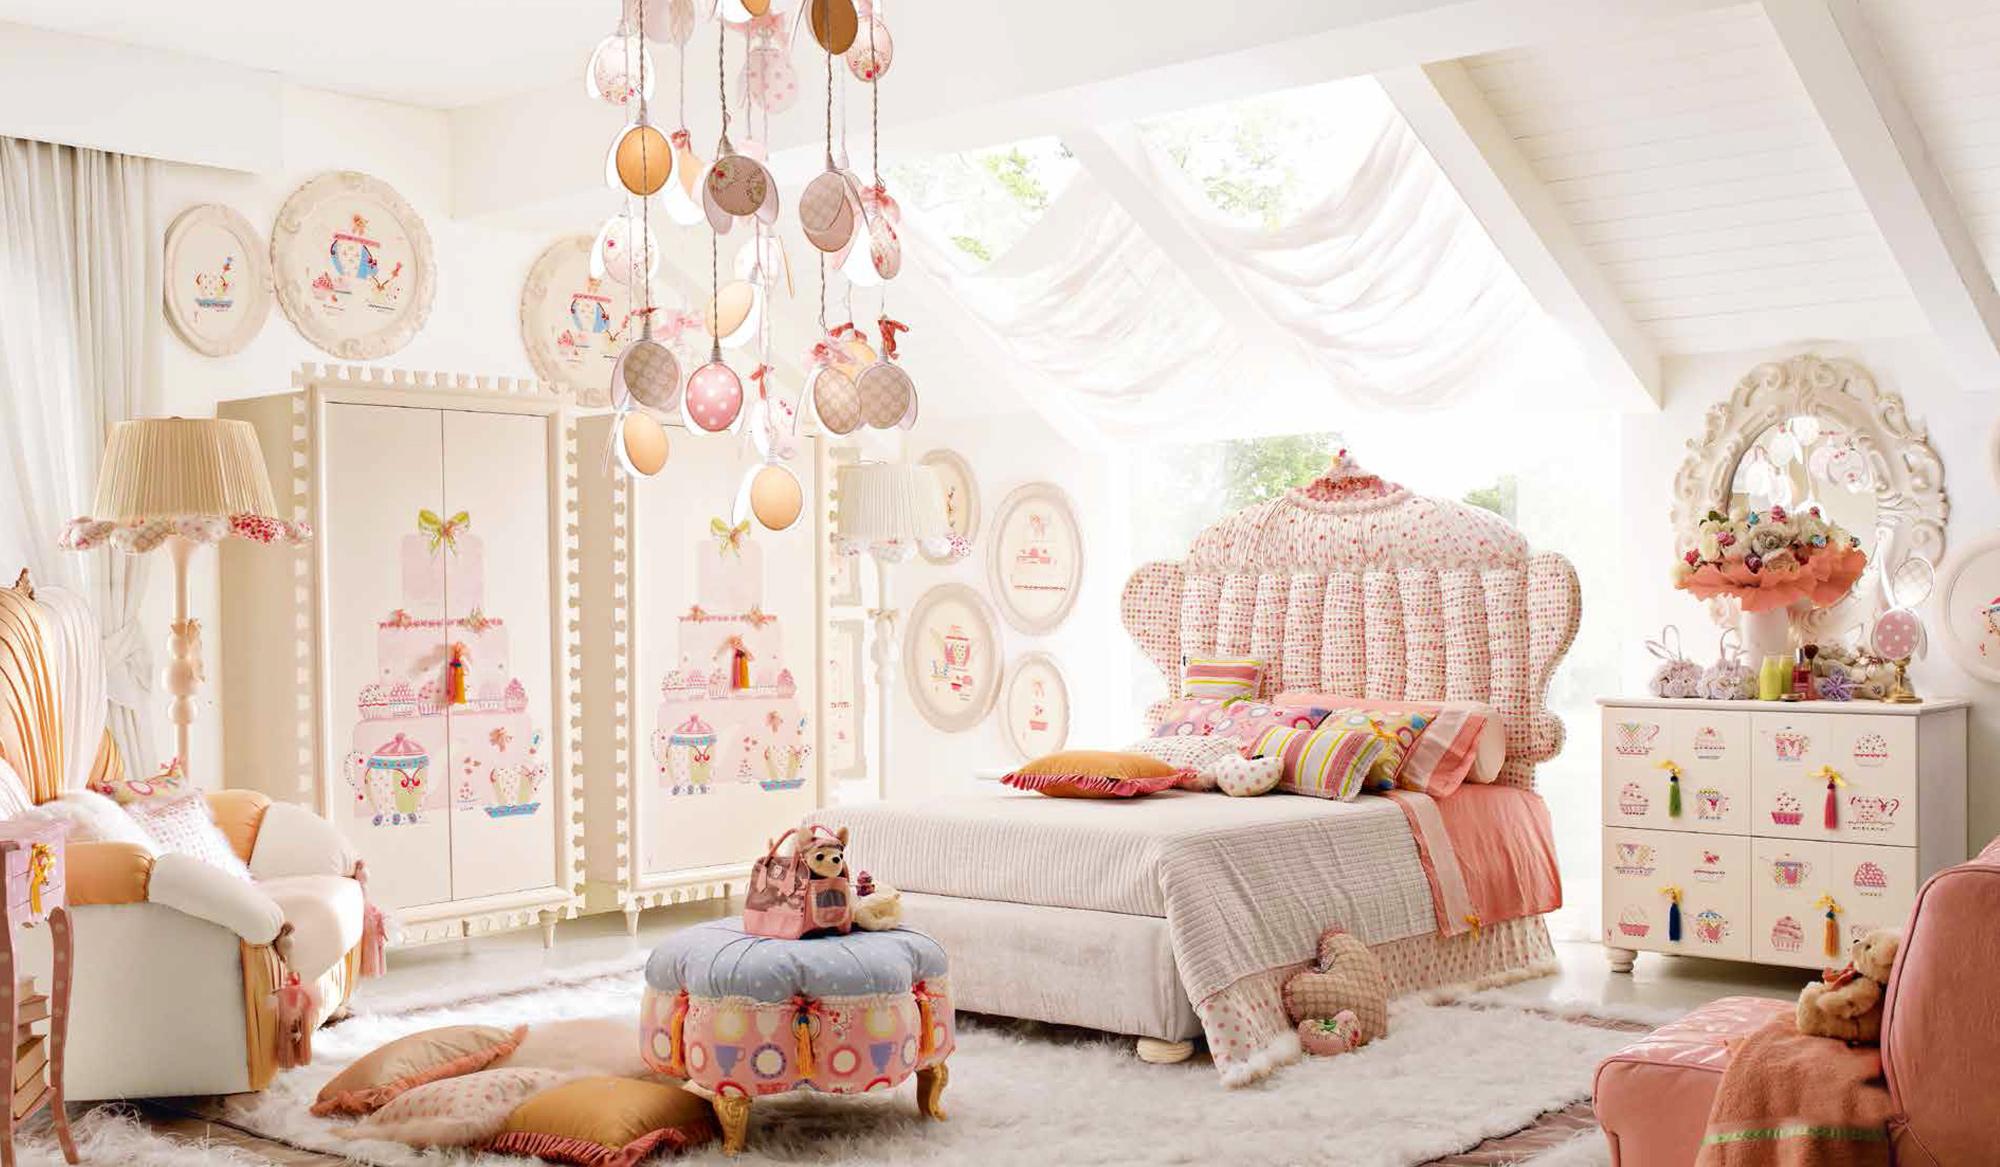 lit d enfant original great lit cabane pour chambre duenfant with lit d enfant original pack. Black Bedroom Furniture Sets. Home Design Ideas